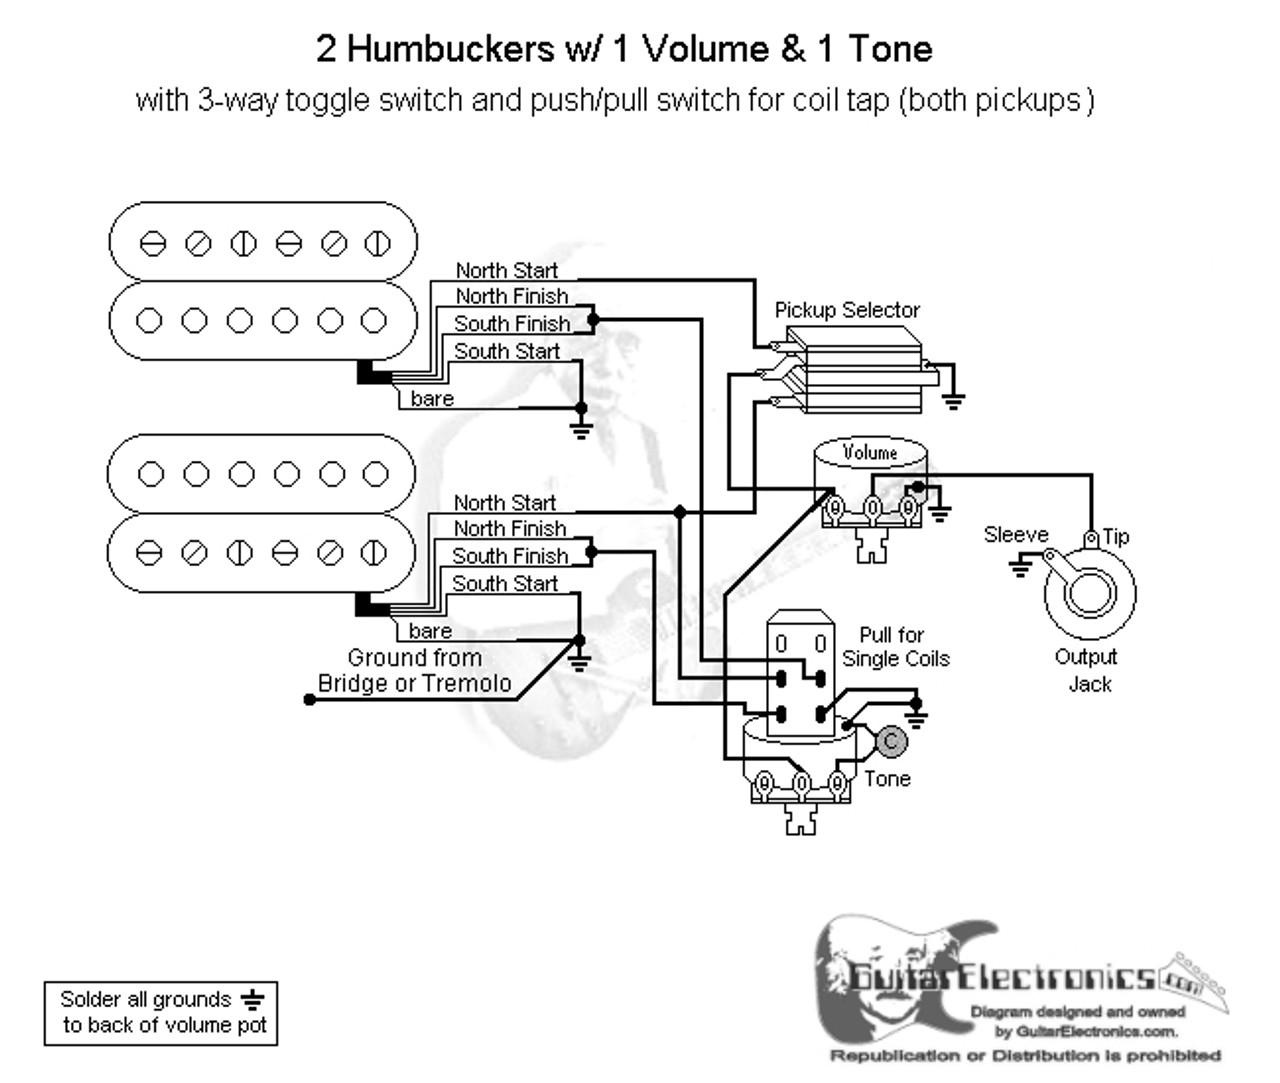 wiring diagram 2 humbucker volume 1 tone wiring diagram k9  2 b humbucker vol tone wiring diagram #12